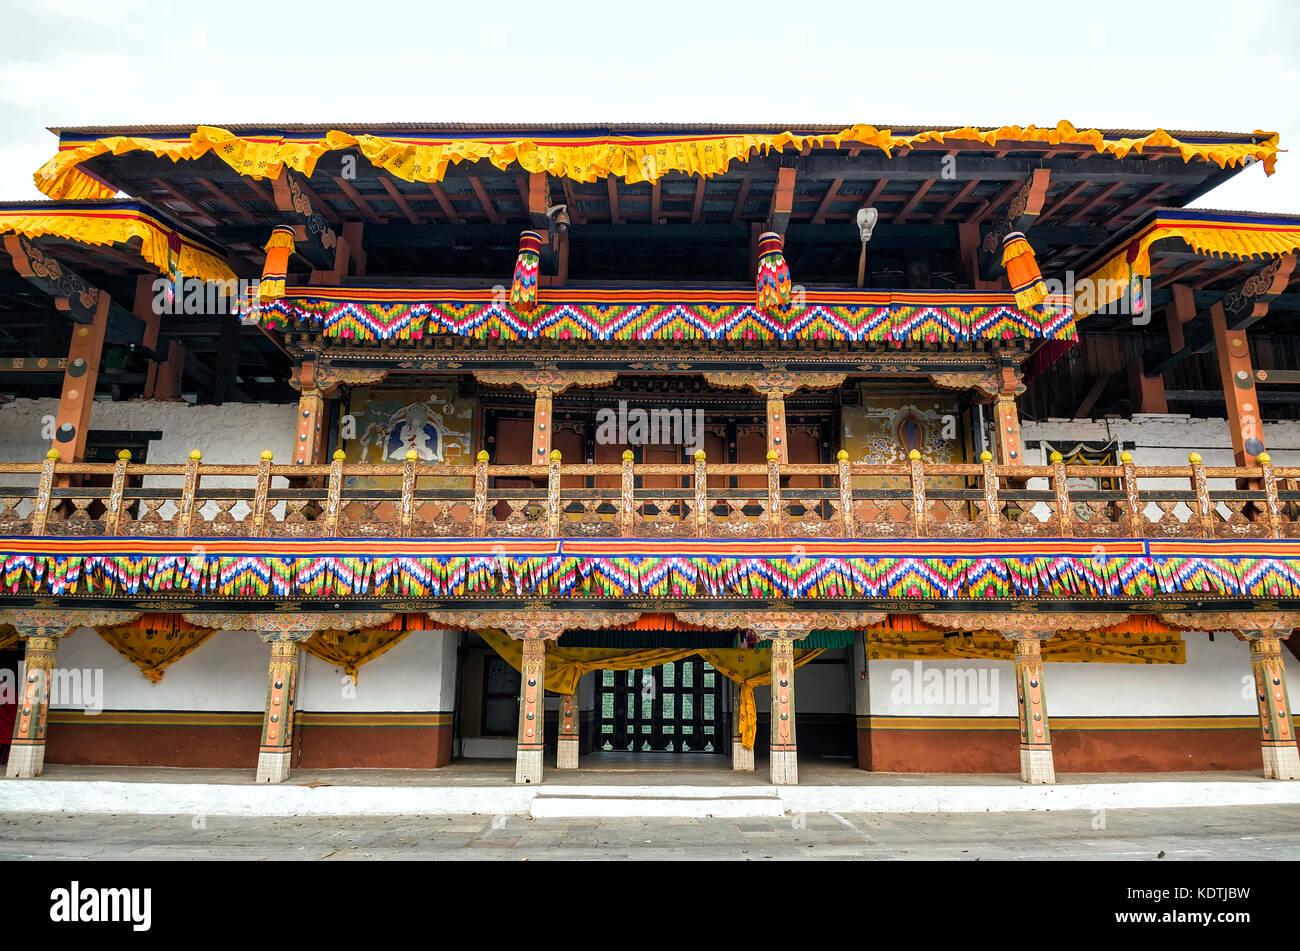 Punakha Dzong, Bhutan - Punakha Dzong or Pungthang Dewachen Phodrang (Palace of Great Happiness) in Punakha, the - Stock Image